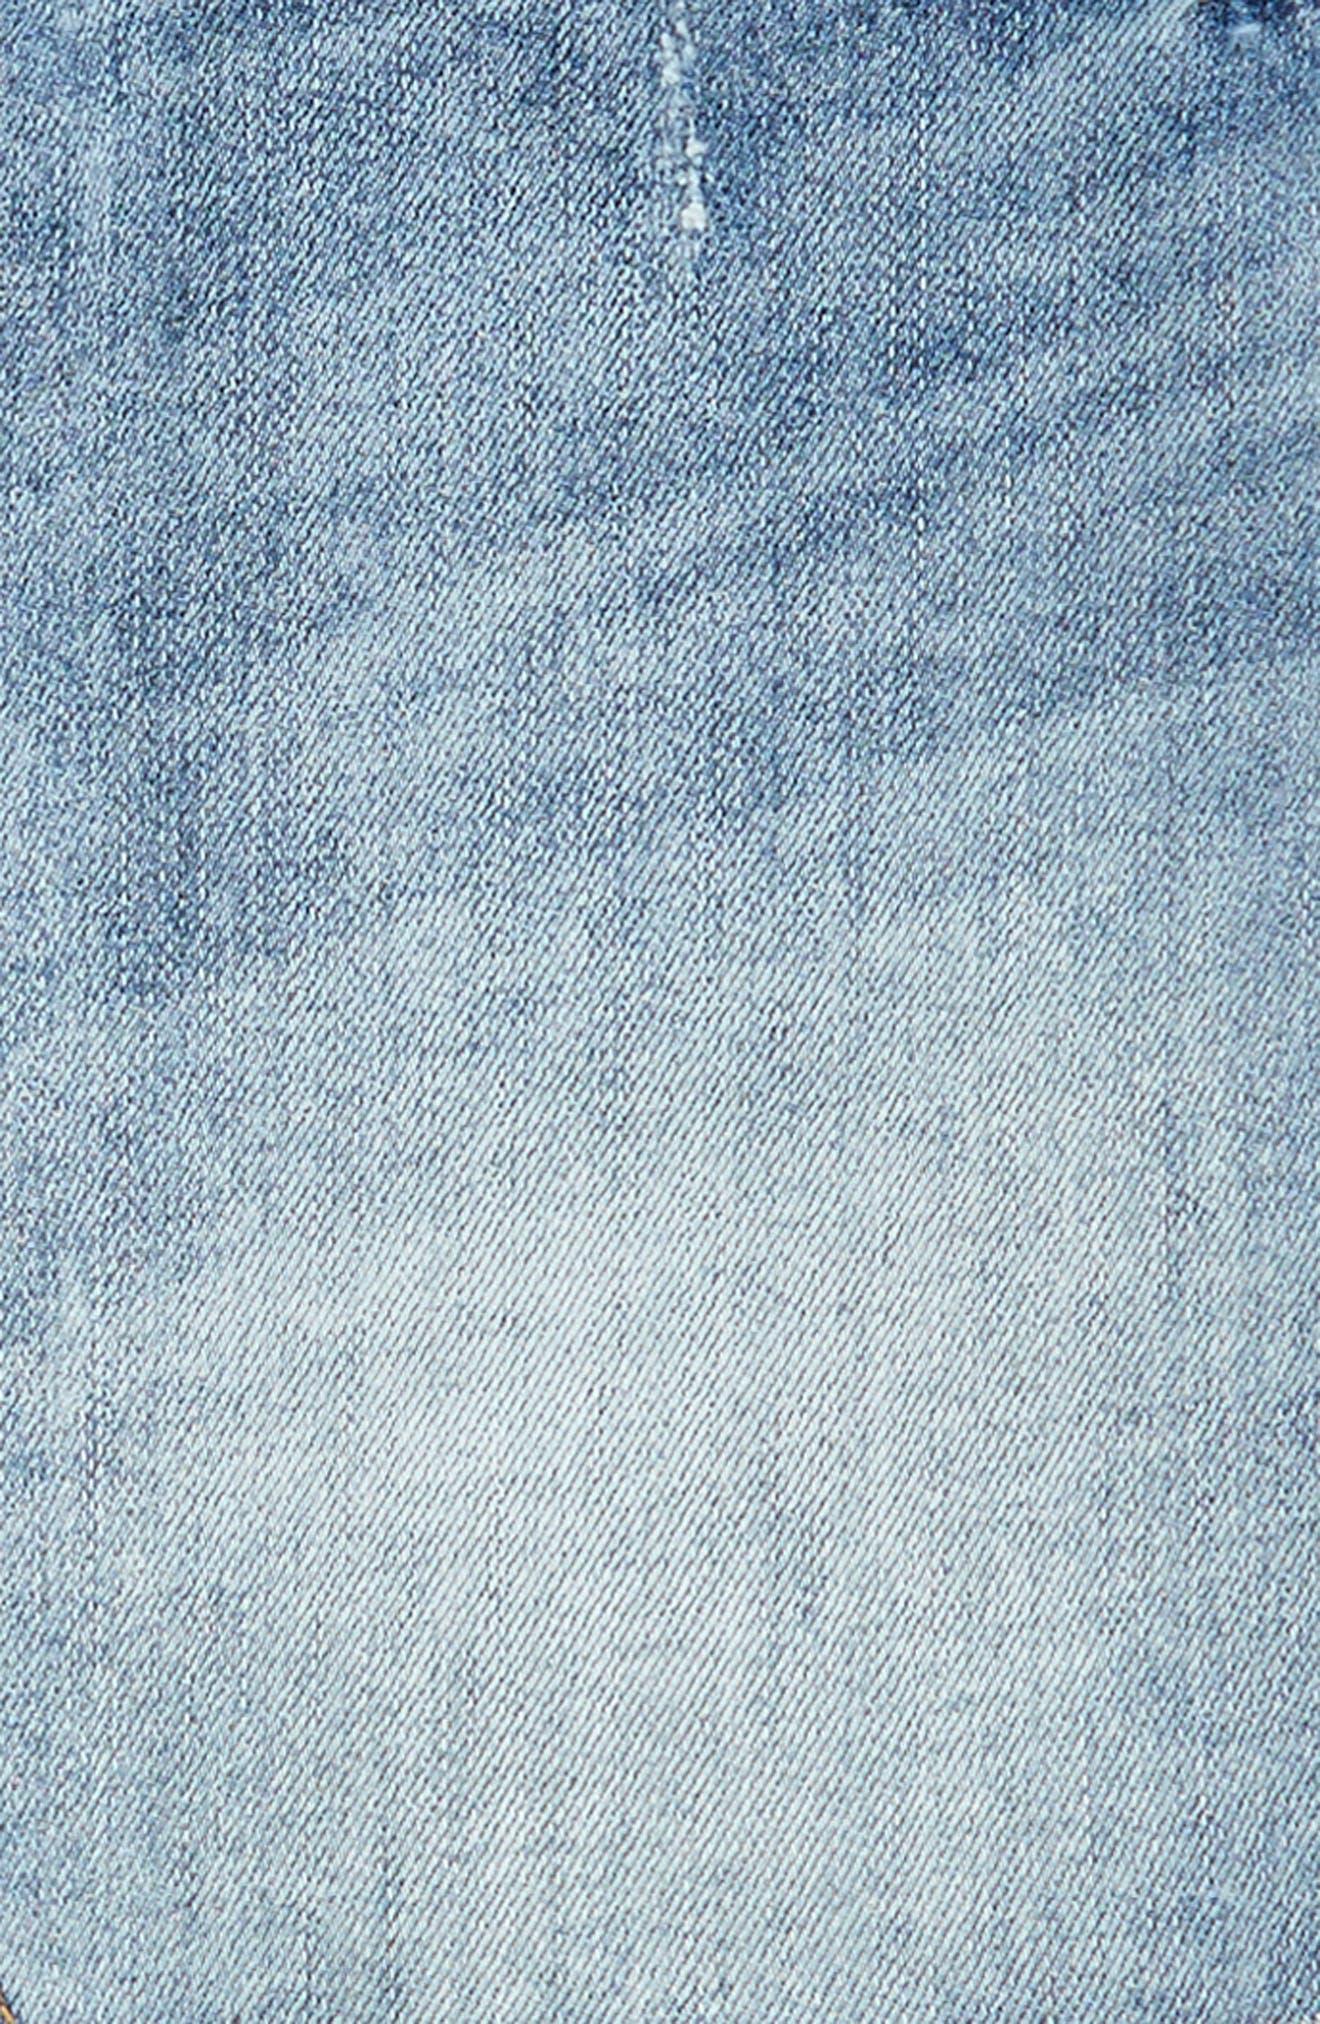 Cutoff Denim Skirt,                             Alternate thumbnail 3, color,                             420